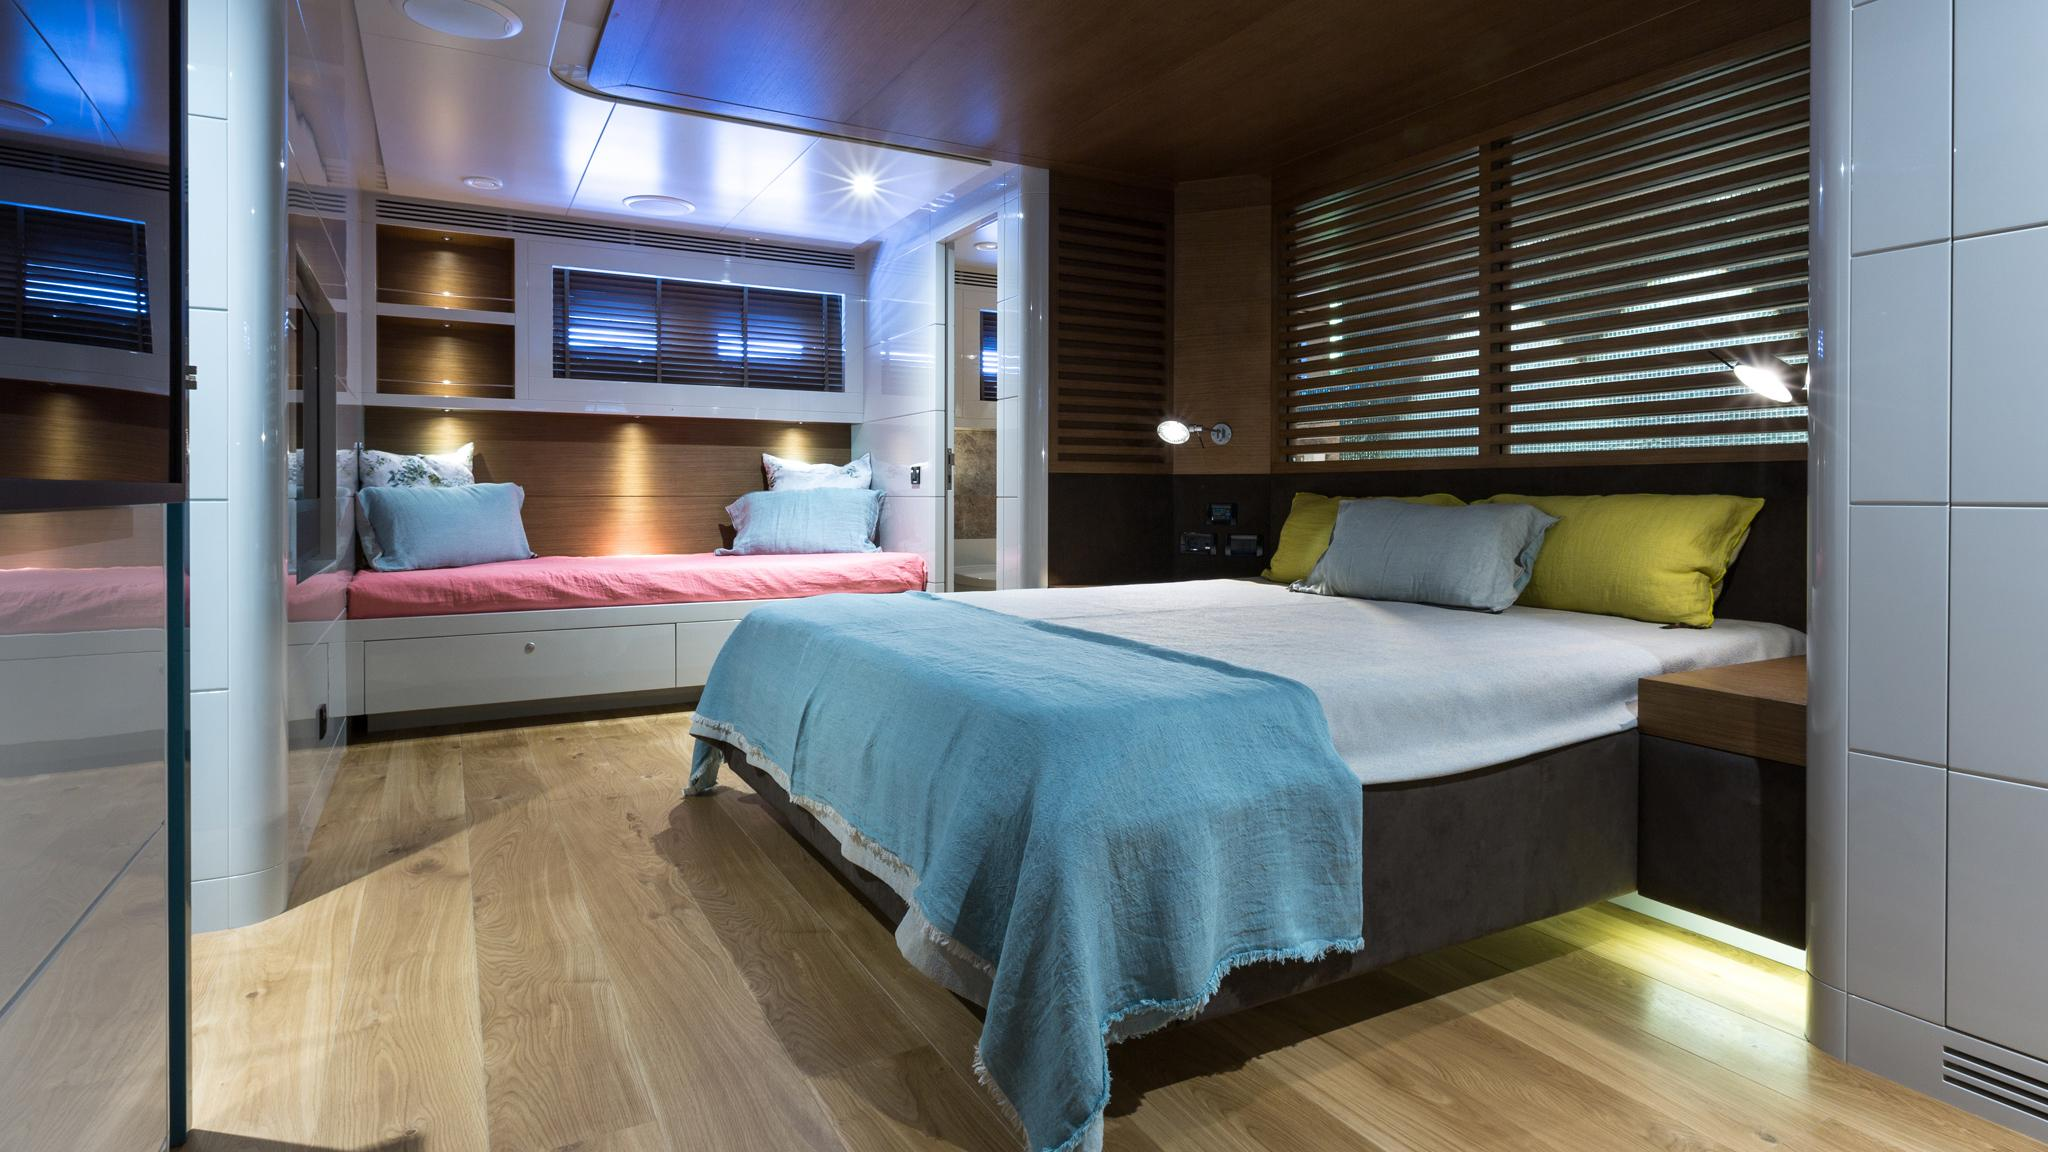 so-mar-motor-yacht-tansu-2014-38m-cabin-double